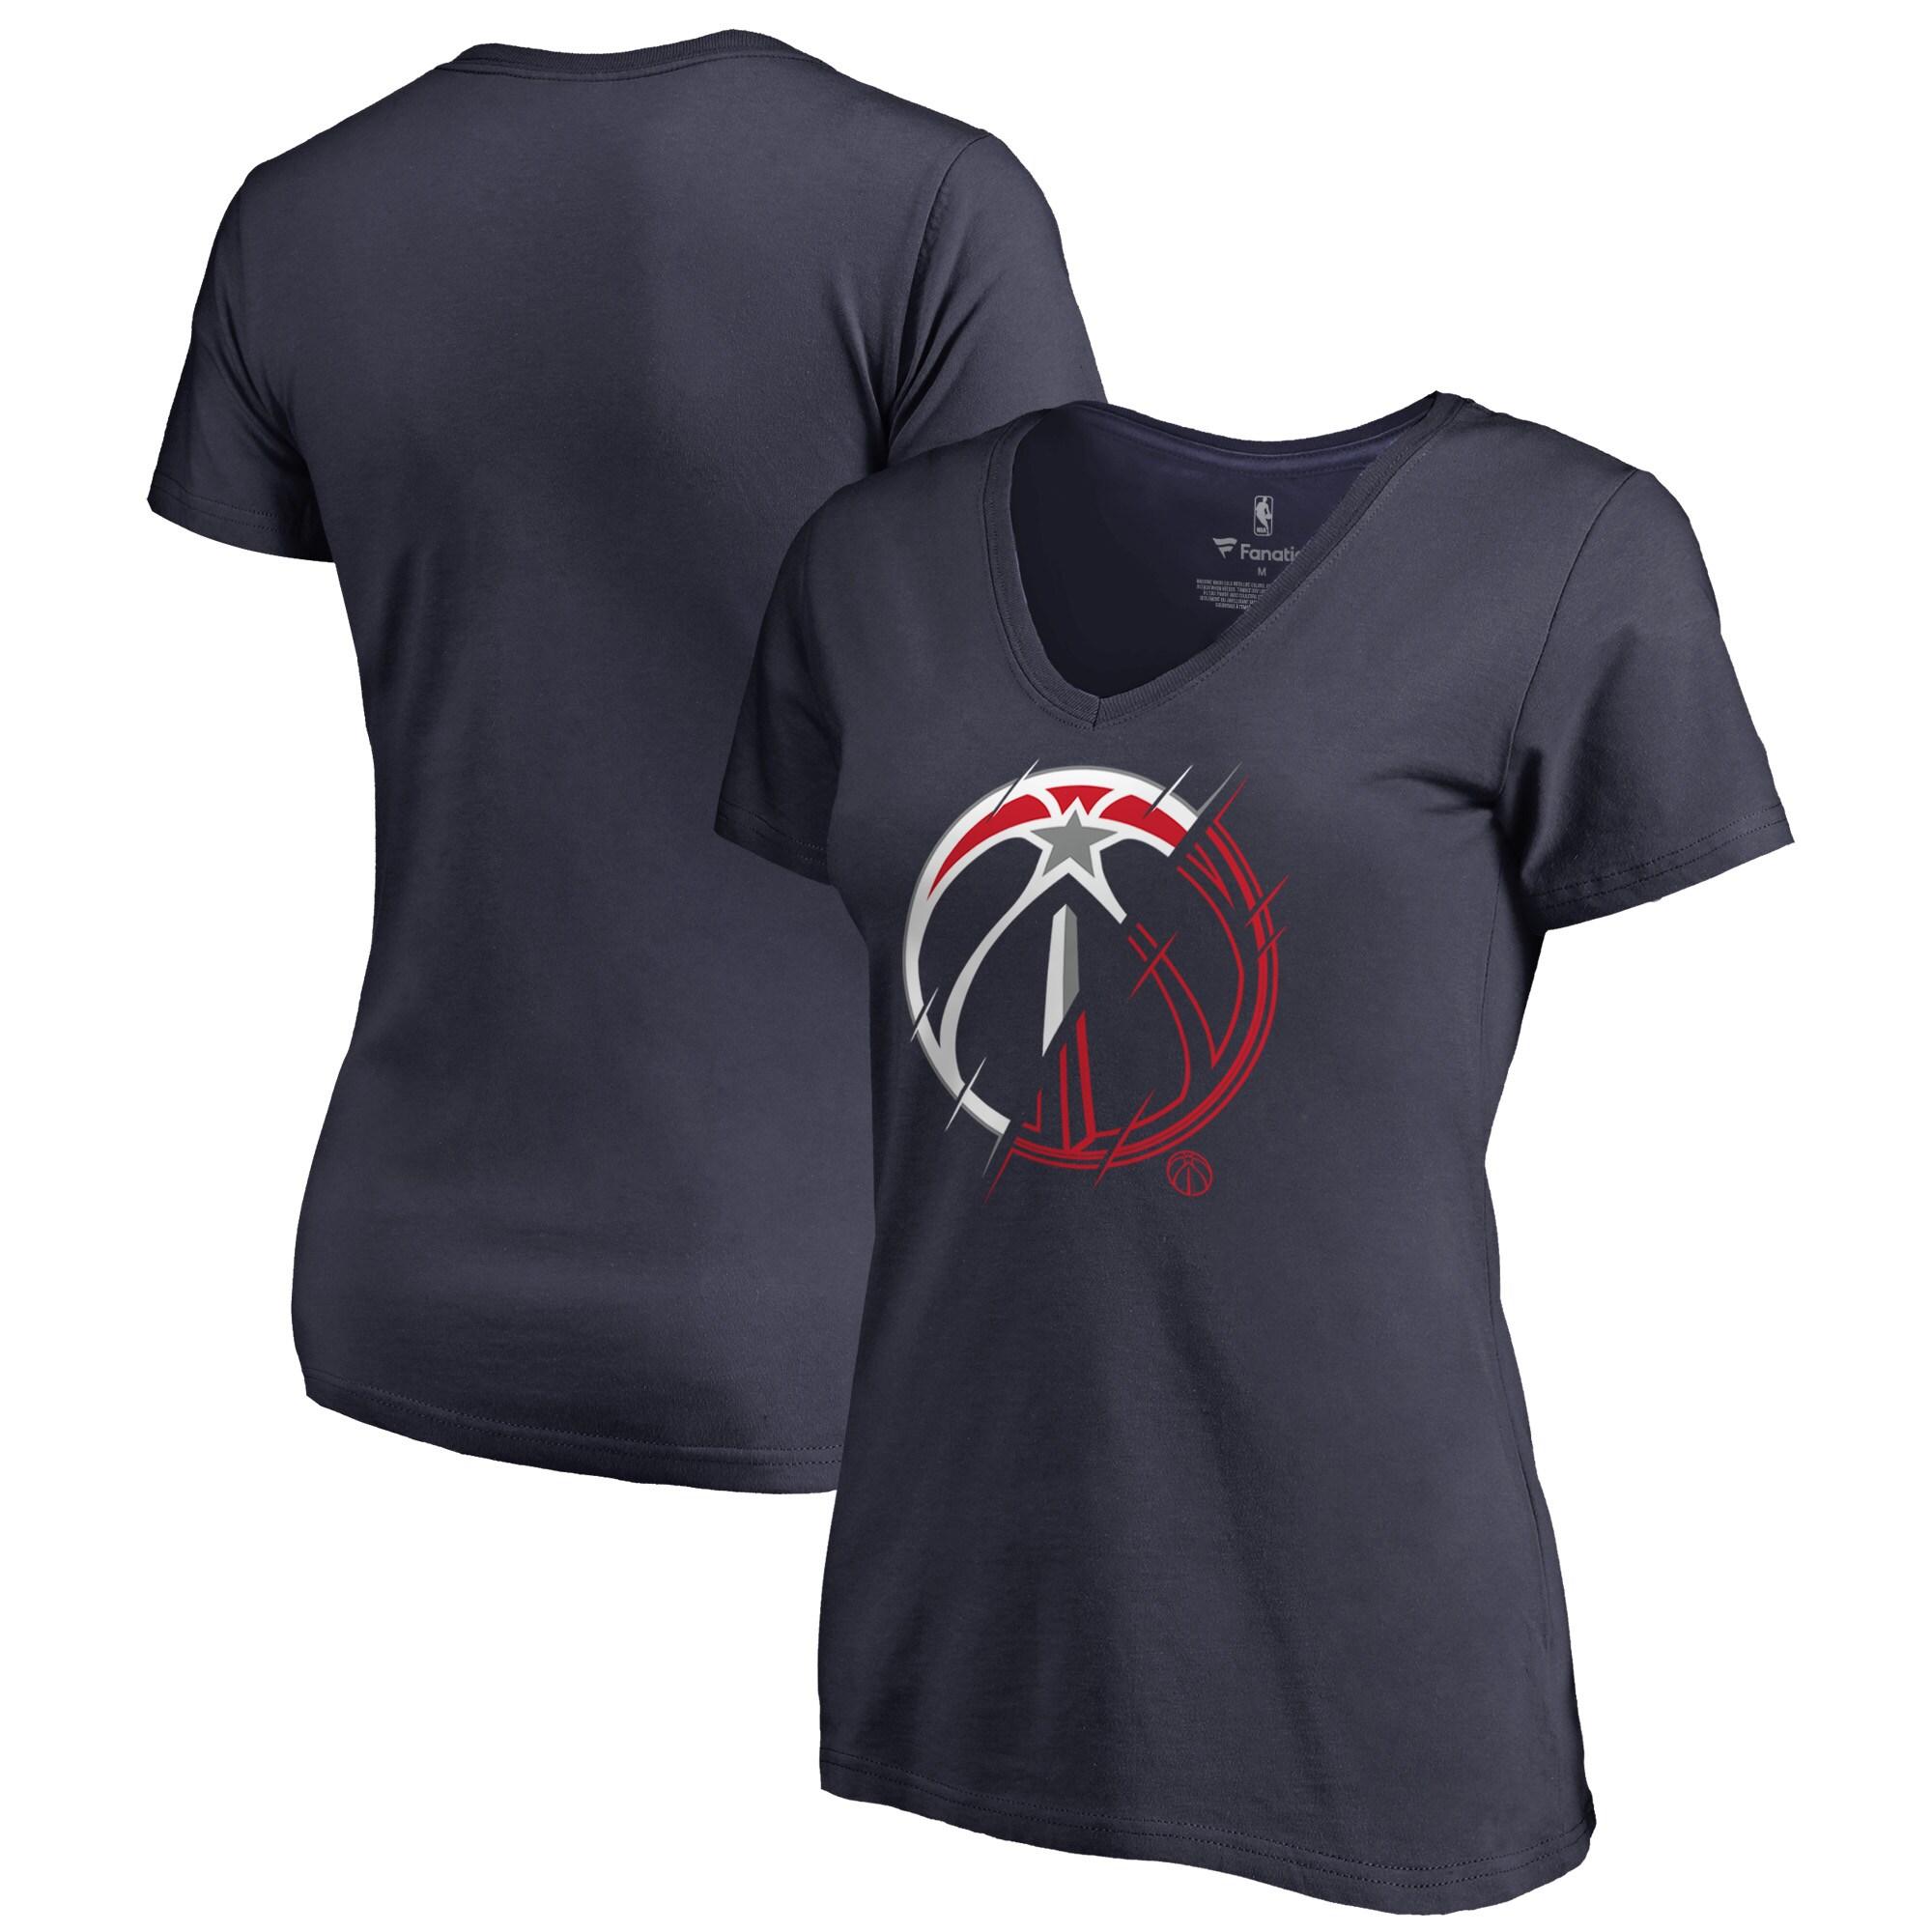 Washington Wizards Fanatics Branded Women's X-Ray Slim Fit V-Neck T-Shirt - Navy